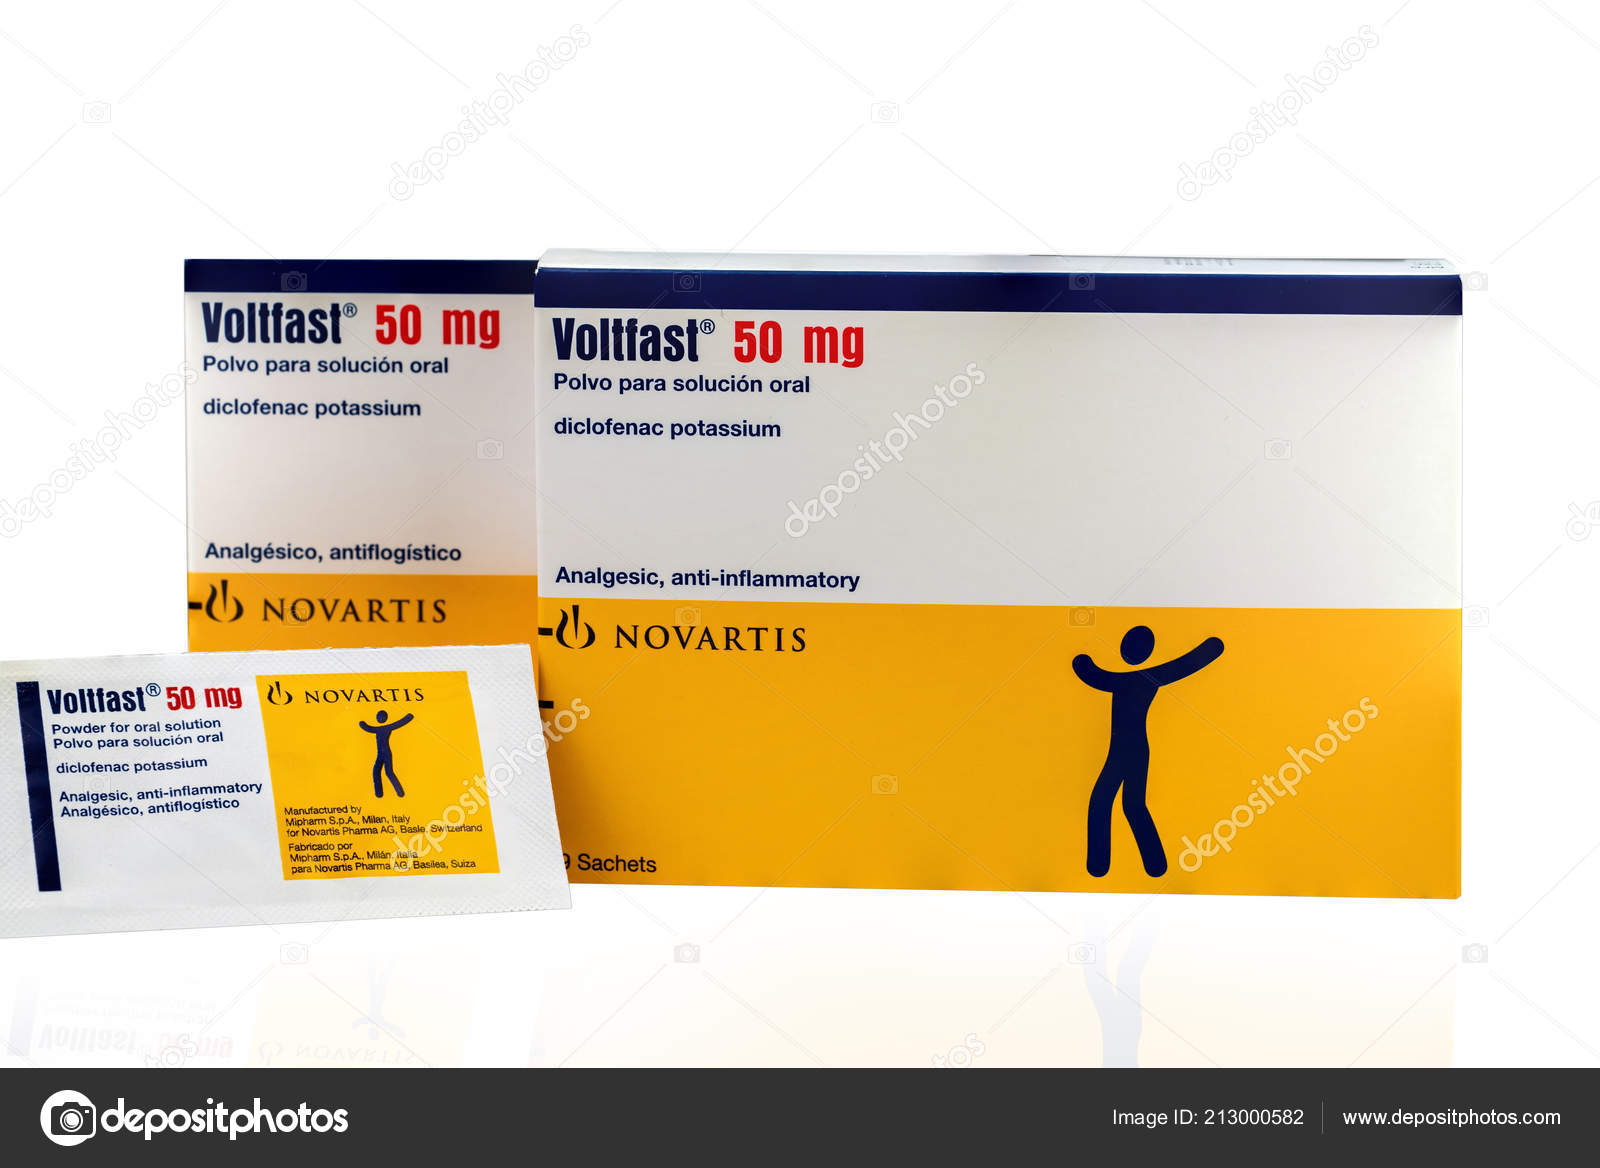 diclofenac potassium 50 mg